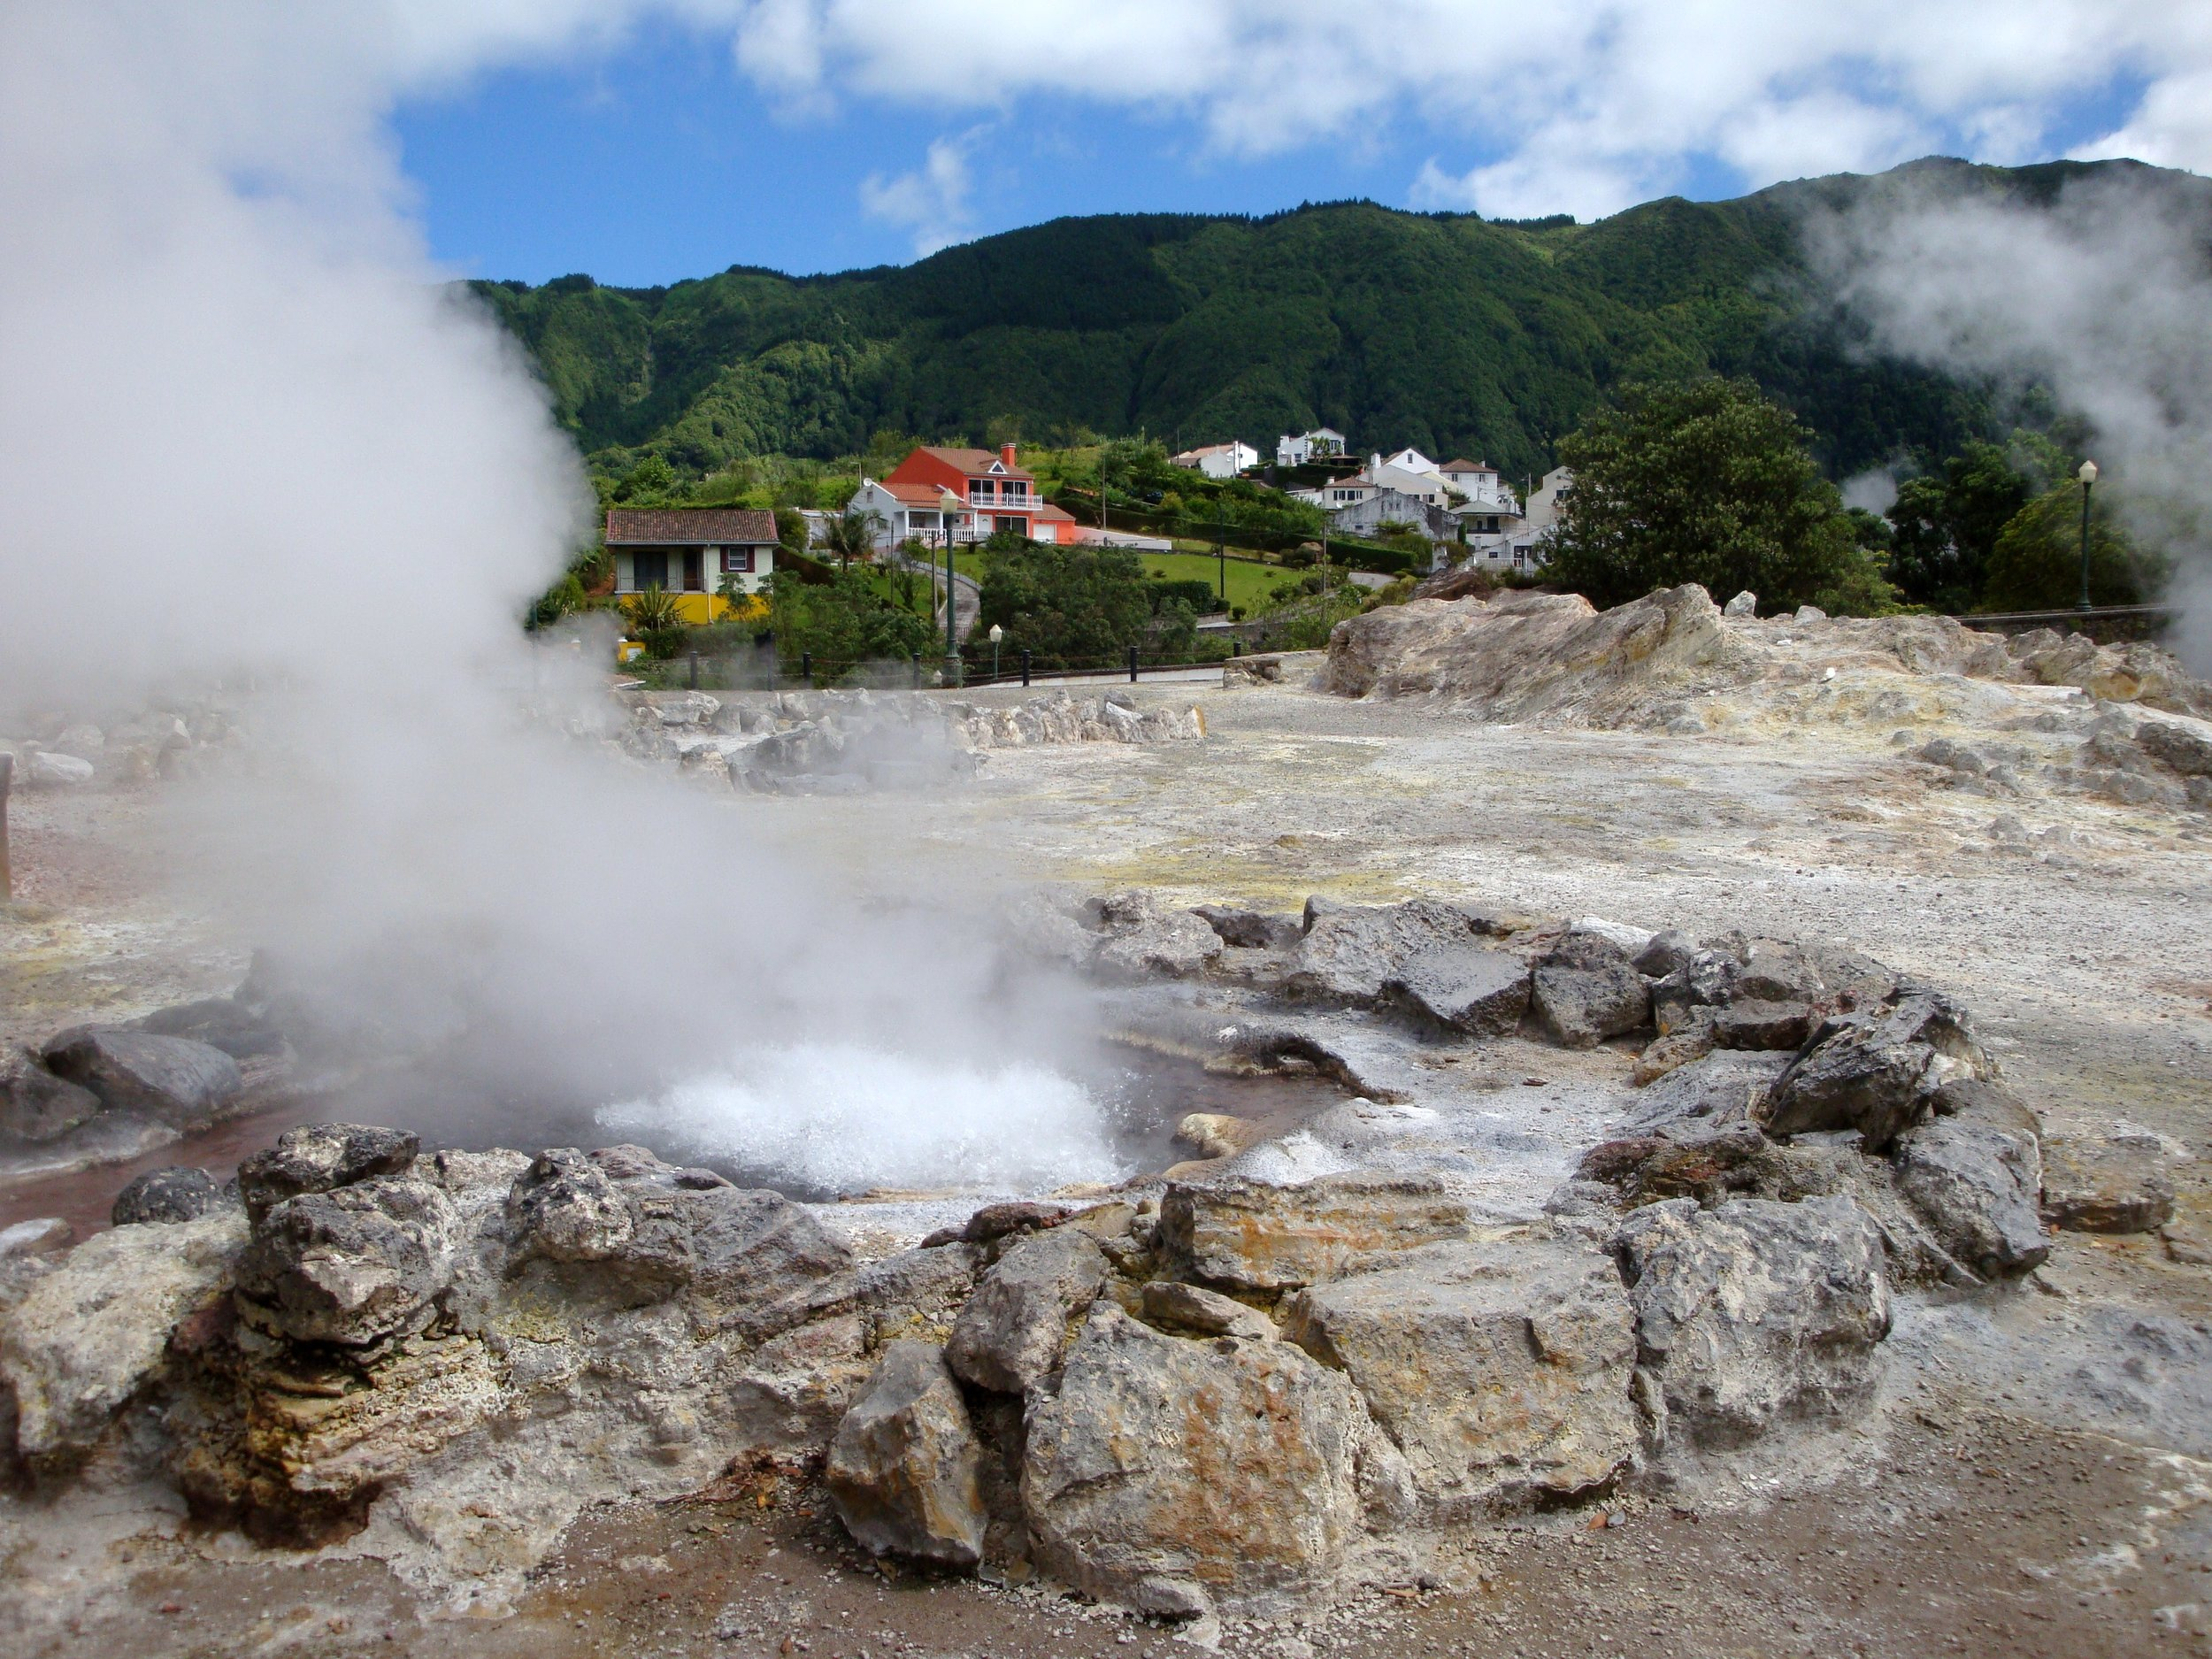 Varme kilder i Furnasdalen på Azorene